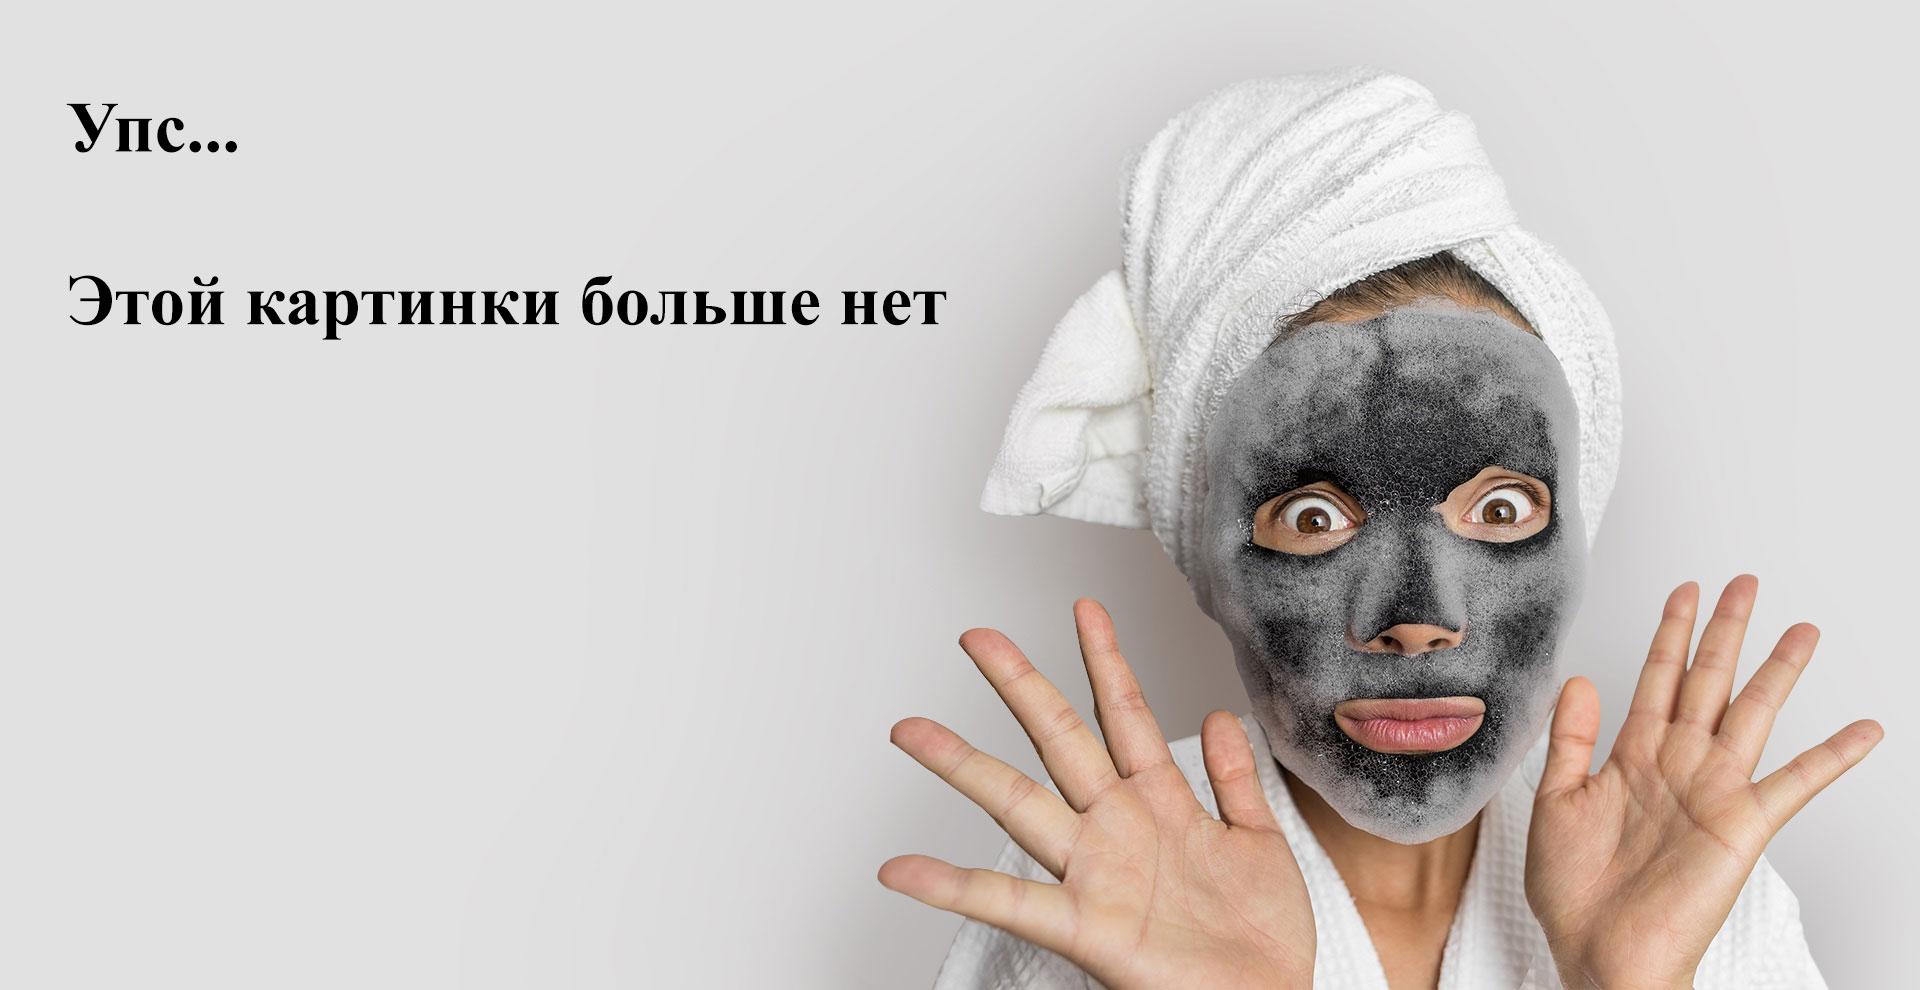 Patrisa Nail, Гель-лак «Стиль жизни» №438